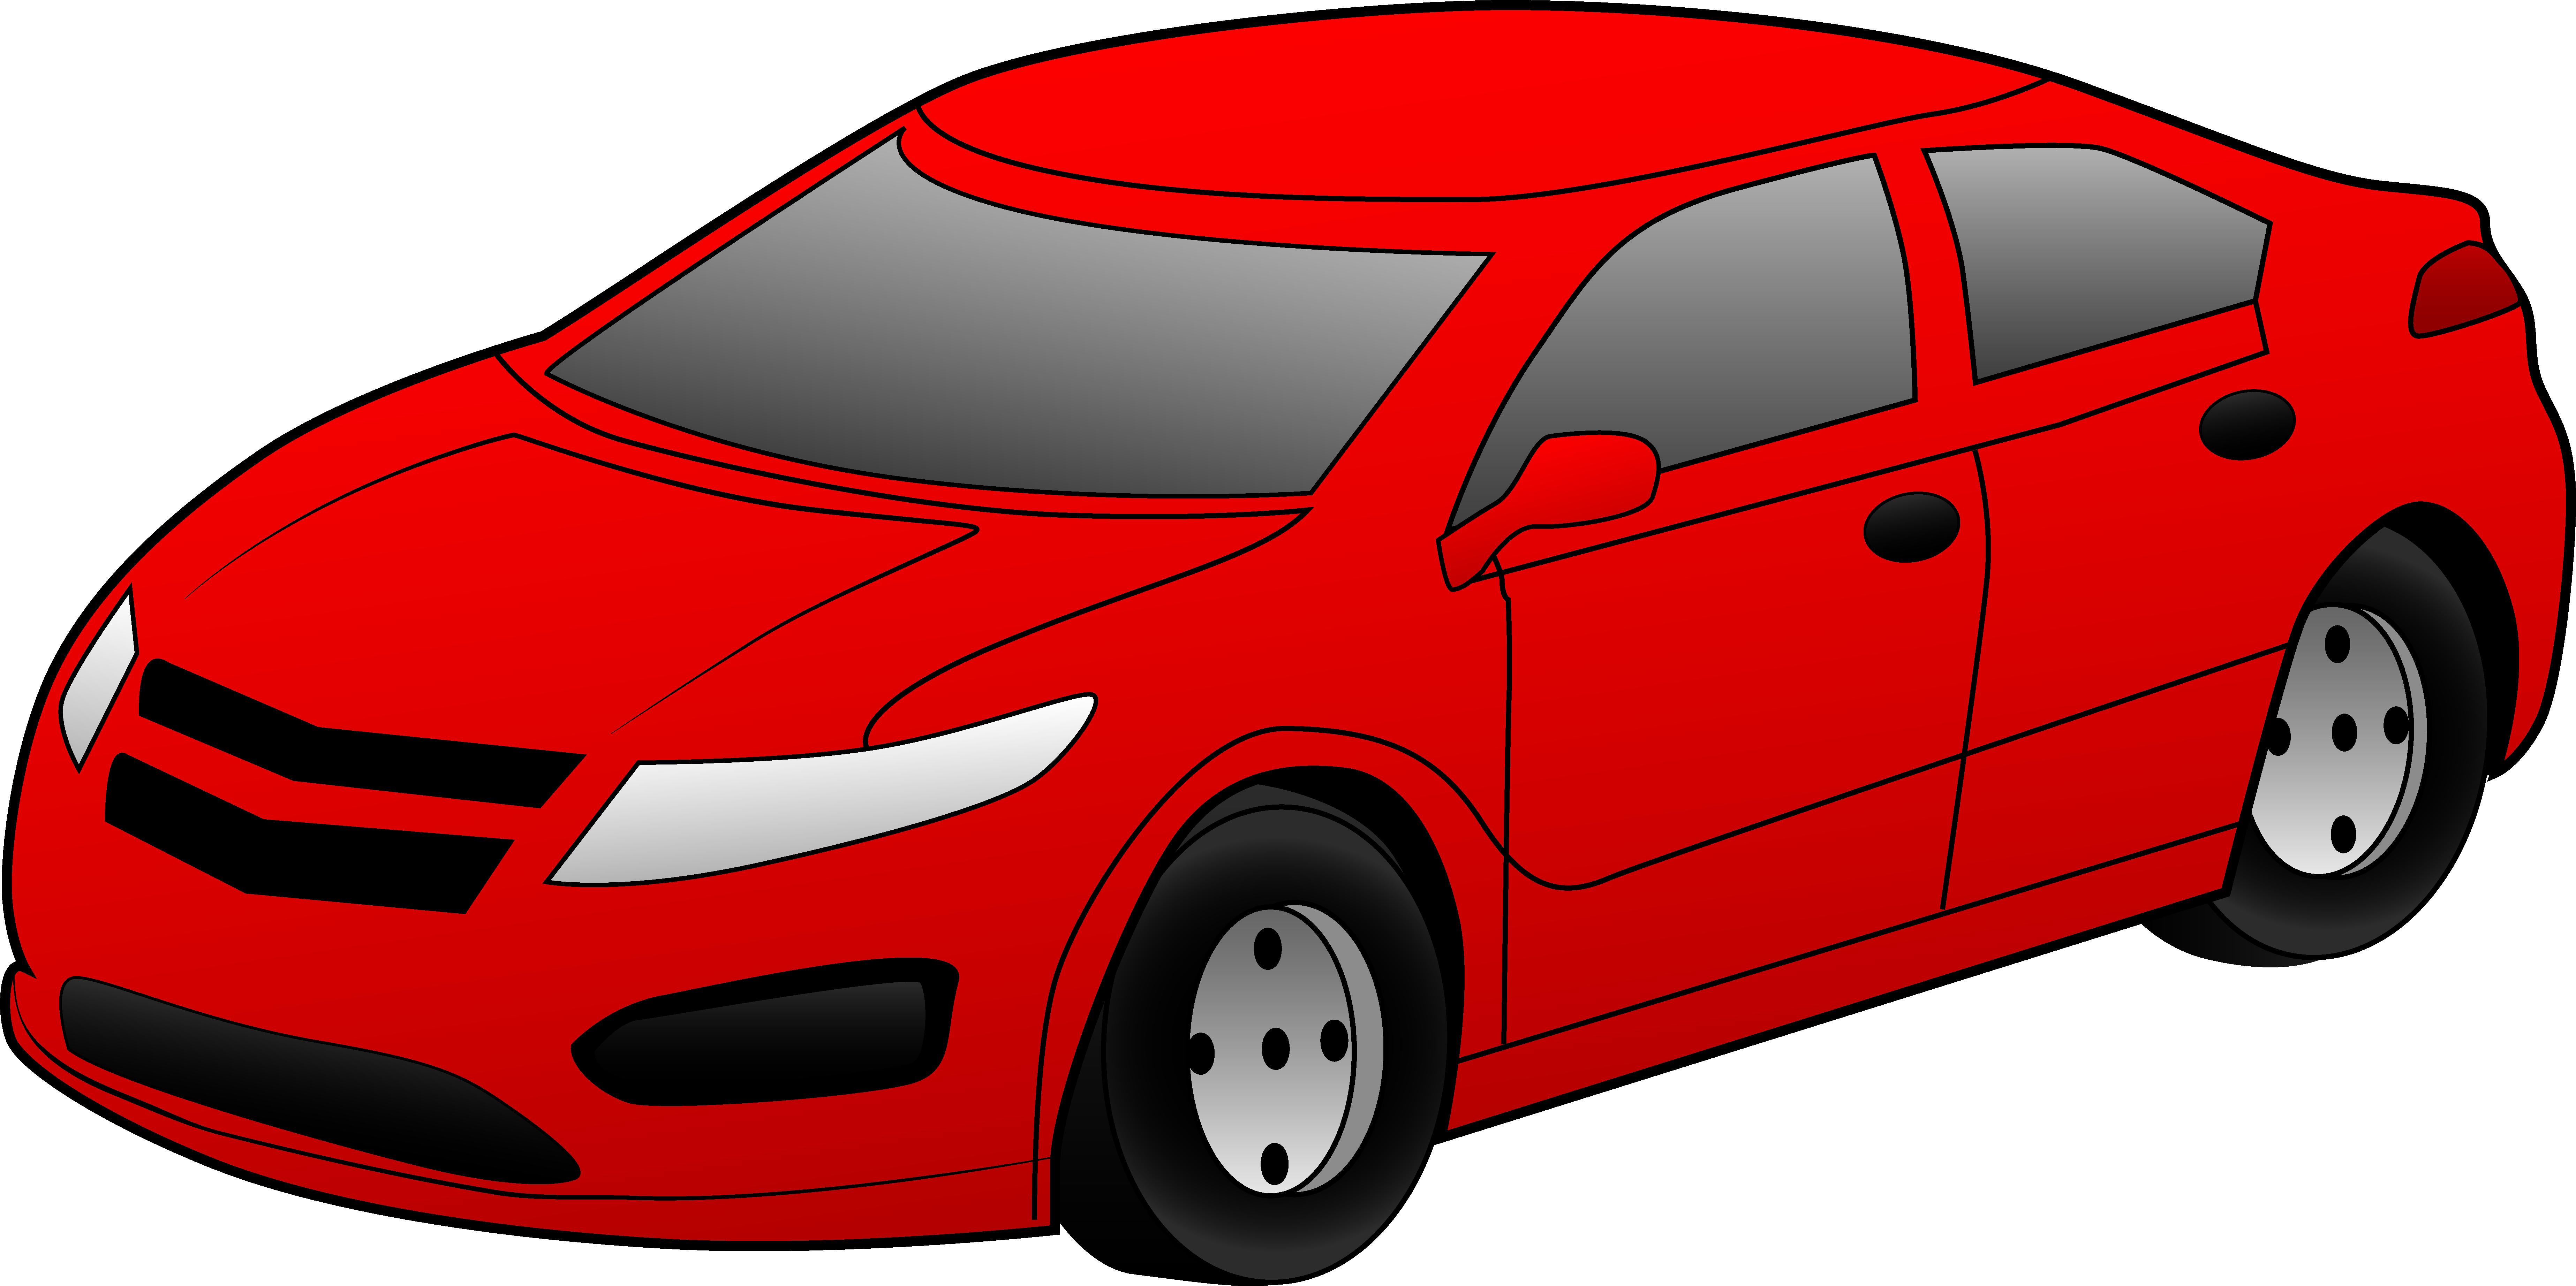 Car Cartoon Png Free Download Best Car Cartoon Png On Clipartmag Com